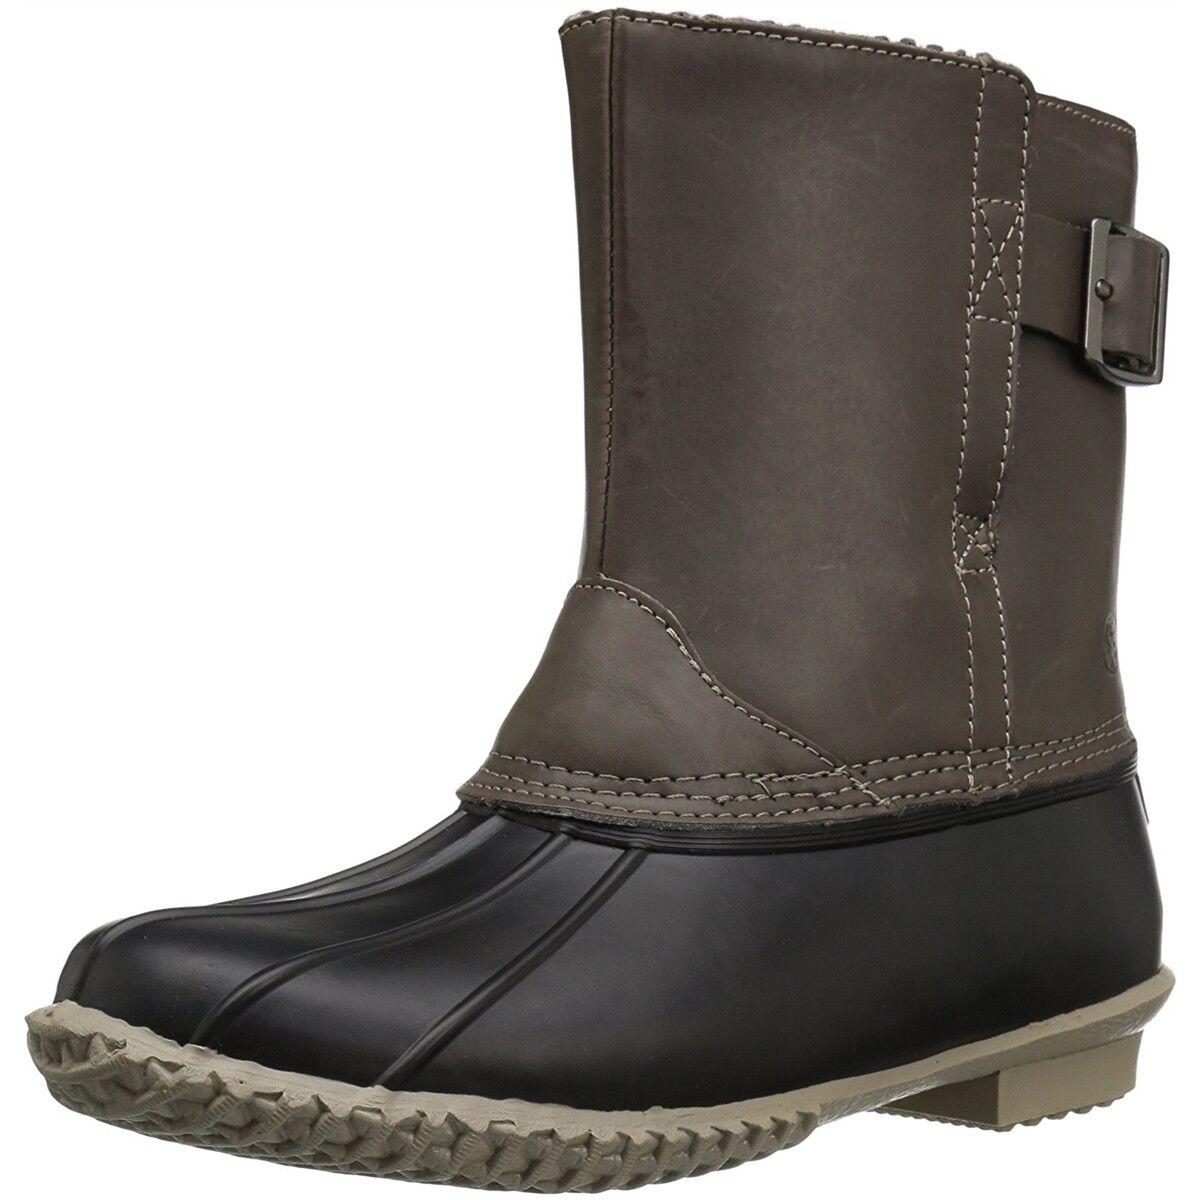 Northside Women Nakoa Waterproof Slip-On Duck Toe Snow Winter Cold Weather Boots